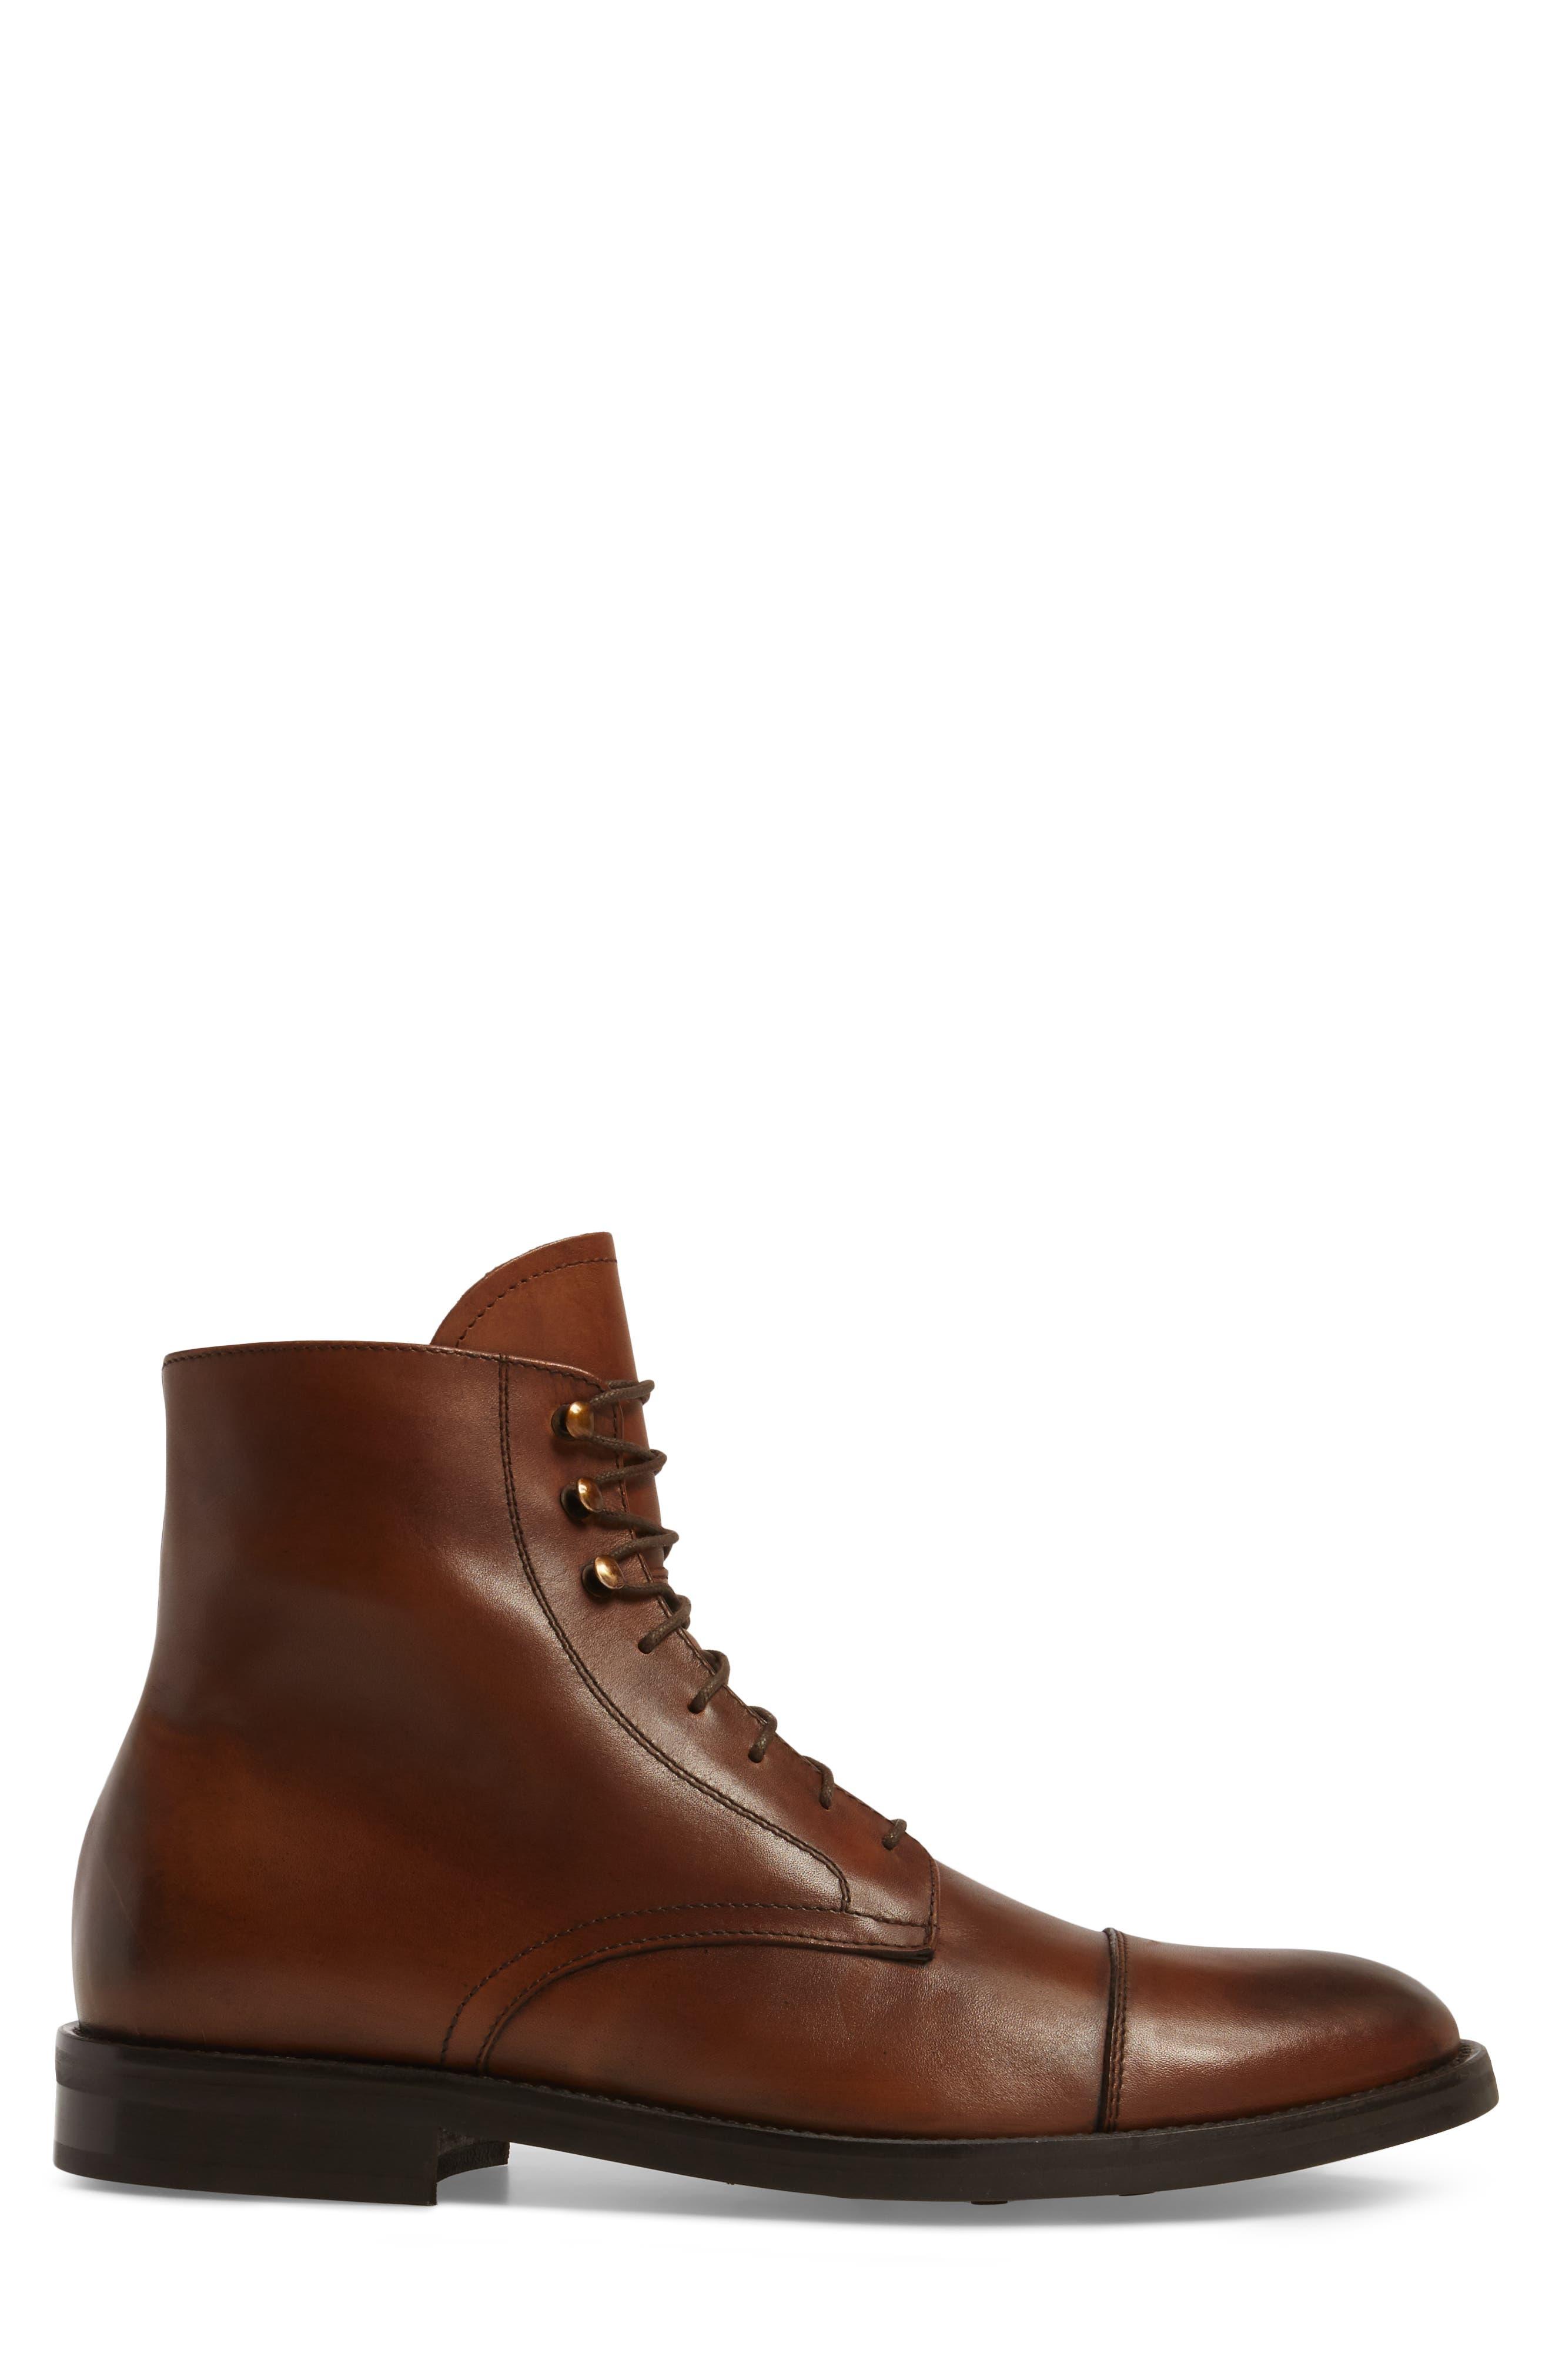 Henri Cap Toe Boot,                             Alternate thumbnail 3, color,                             Cuoio Leather